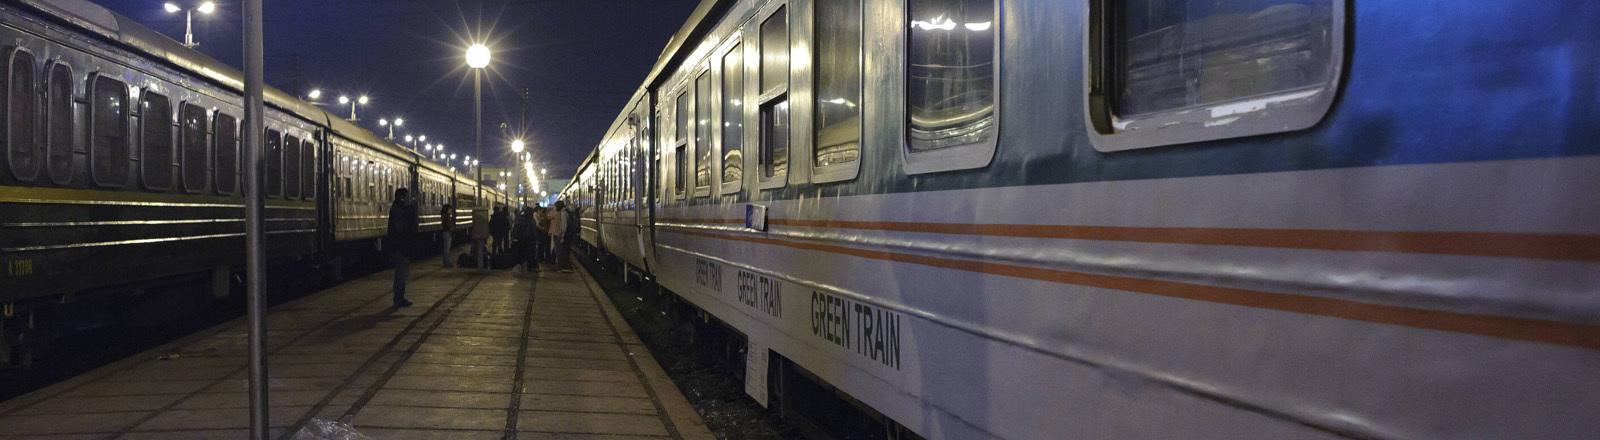 Zug nach Lao Cai am Hauptbahnhof  in Hanoi.